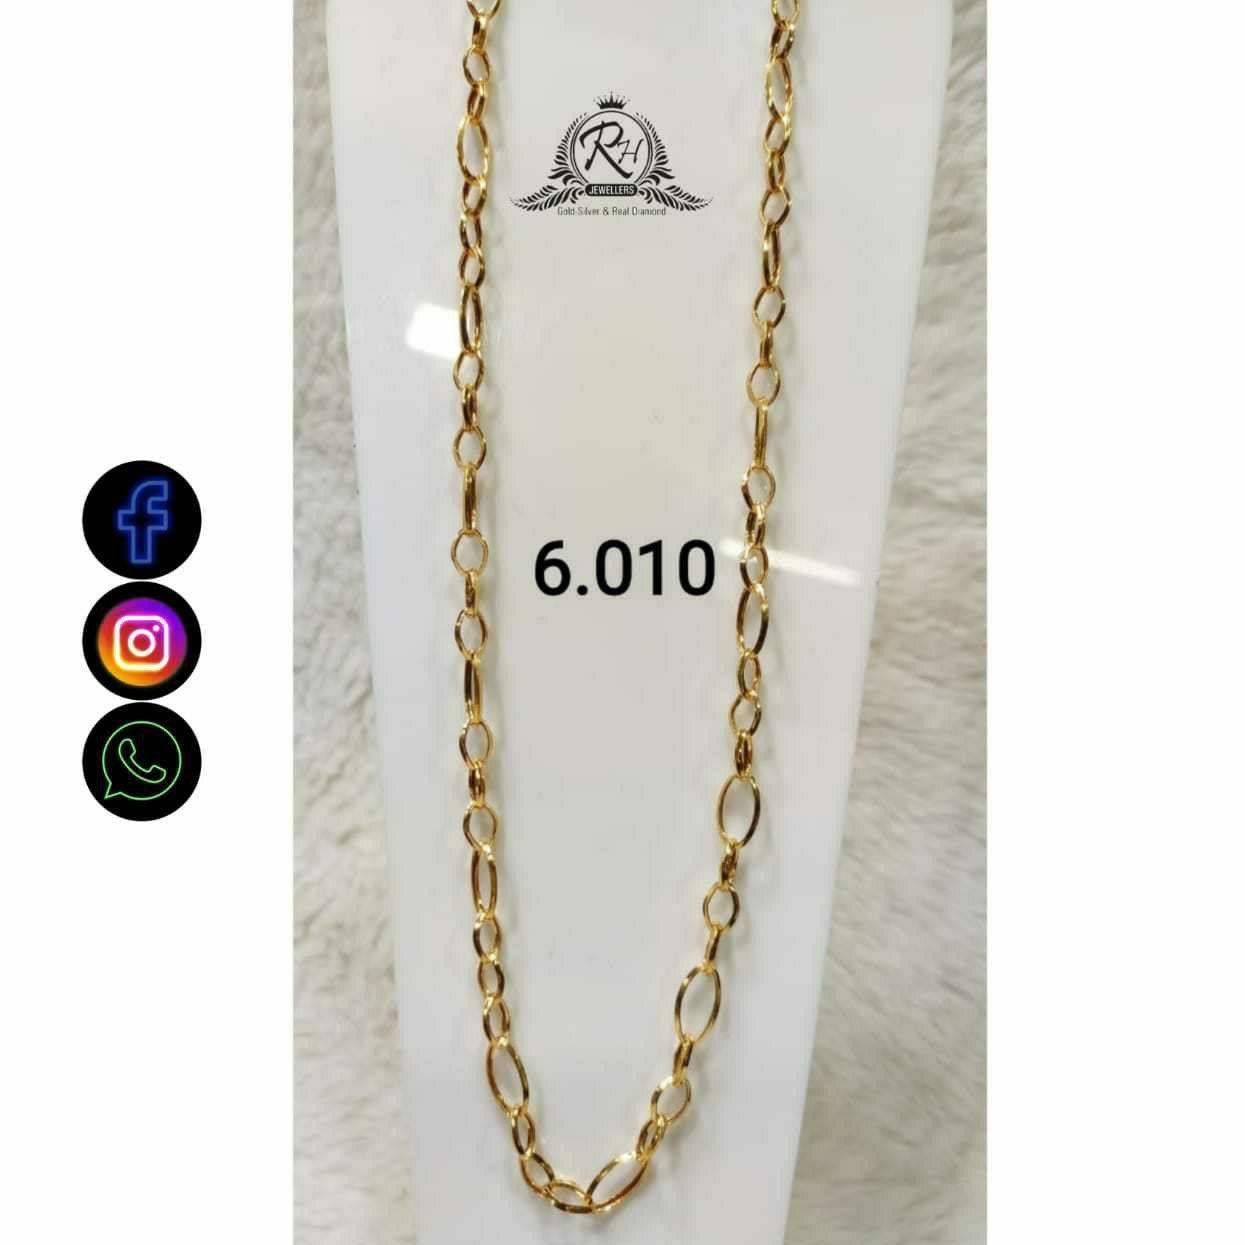 22 Carat Gold Gents Chain RH-CH780